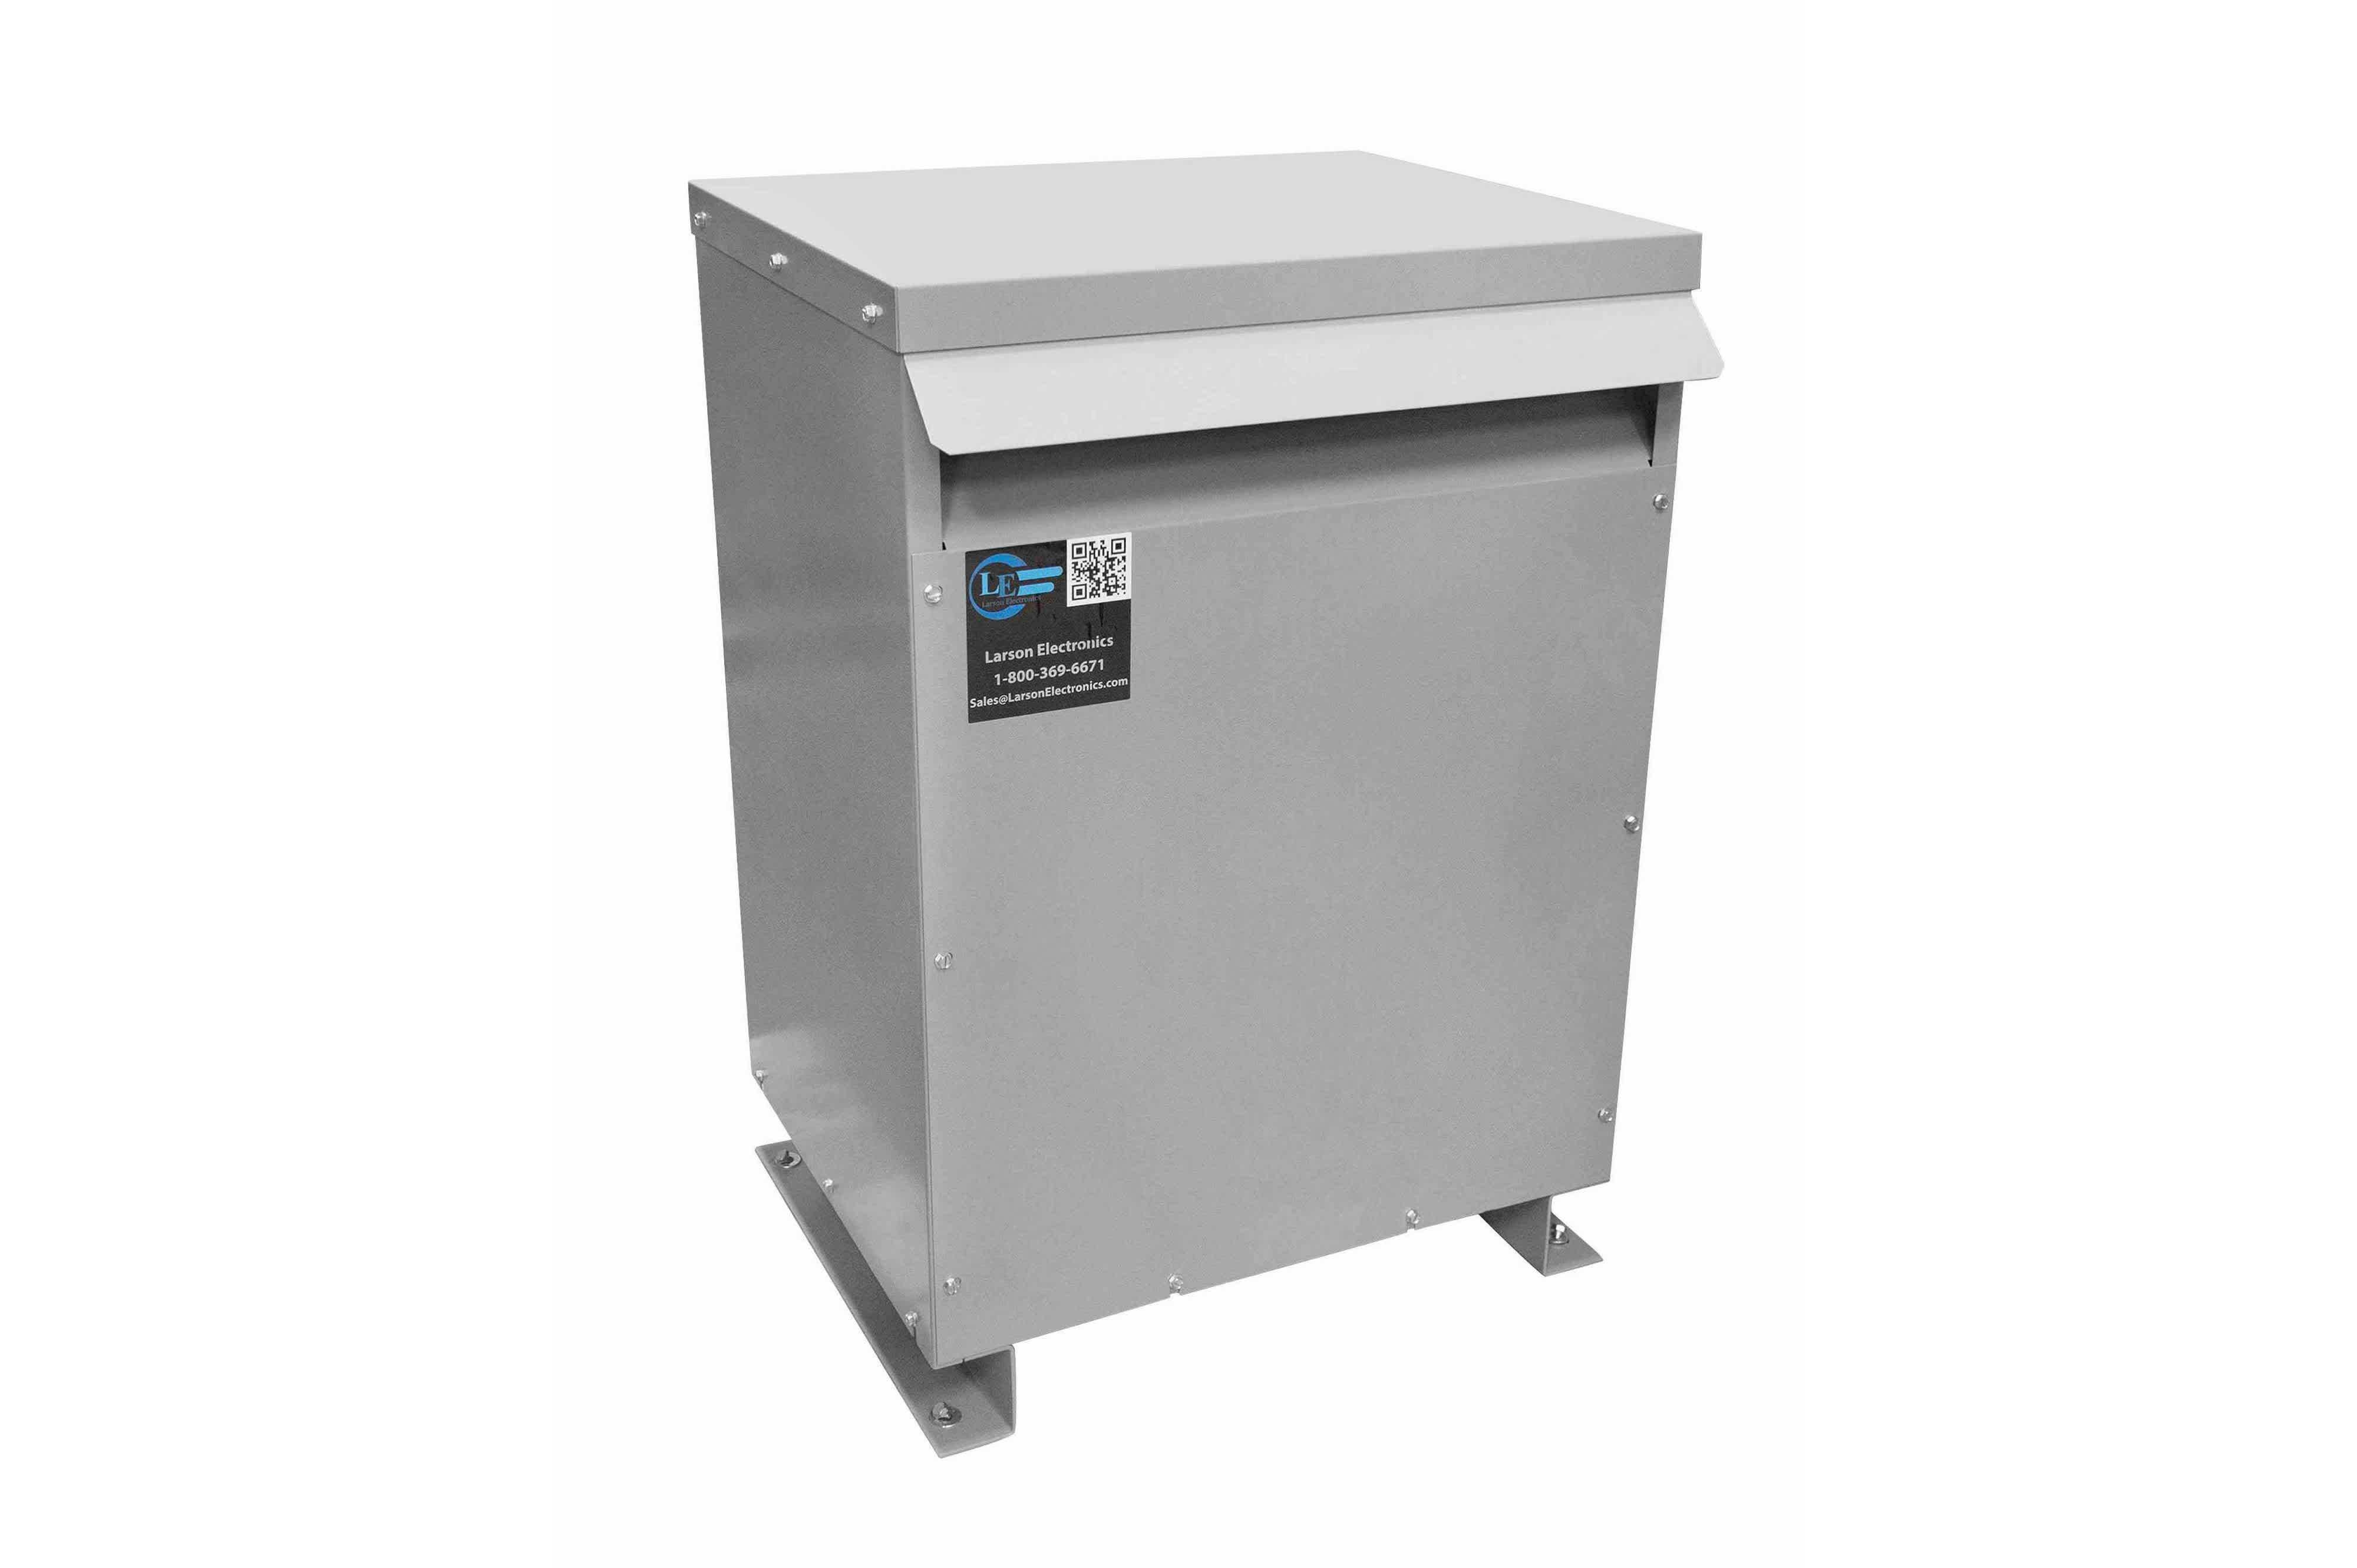 26 kVA 3PH Isolation Transformer, 480V Wye Primary, 380V Delta Secondary, N3R, Ventilated, 60 Hz